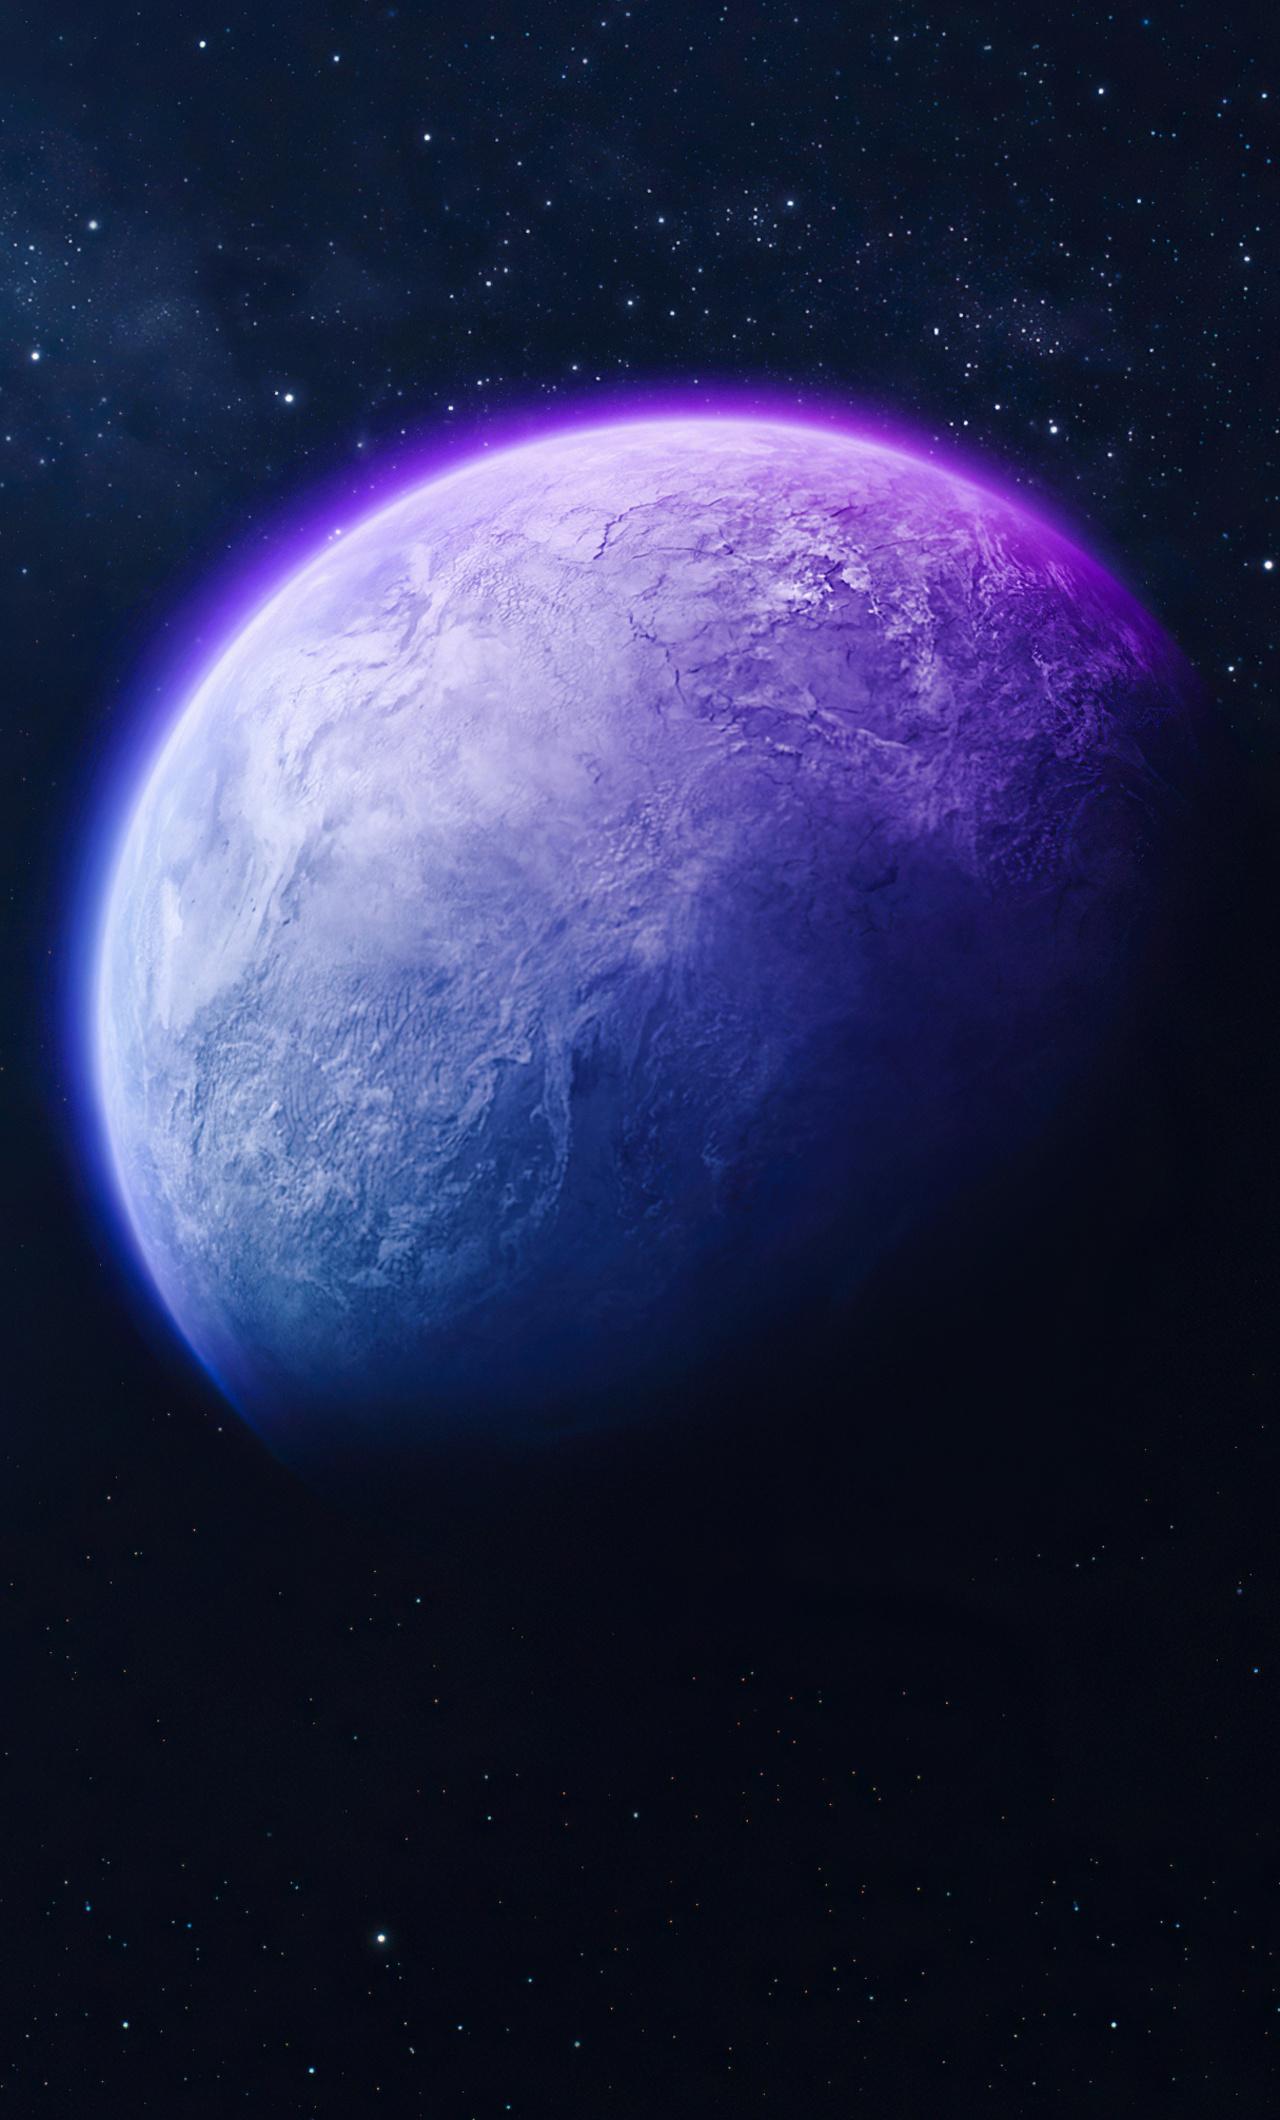 blissfully-alone-planet-4k-kp.jpg